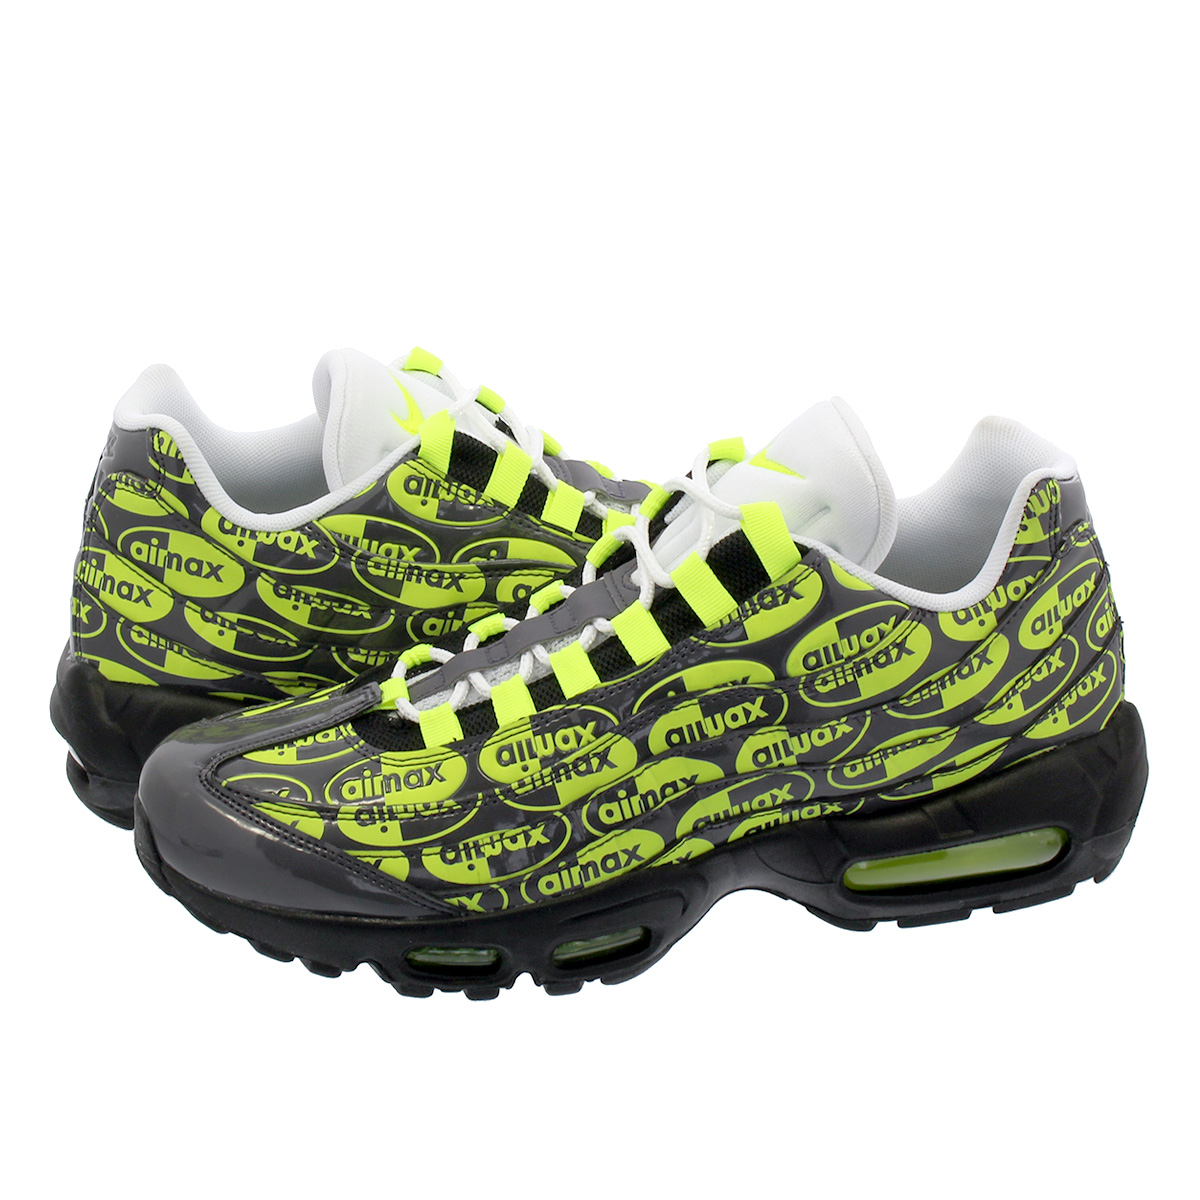 best sneakers 88453 766a9 NIKE AIR MAX 95 PREMIUM Kie Ney AMAX 95 premium BLACK/VOLT/ASH/WHITE  538,416-019